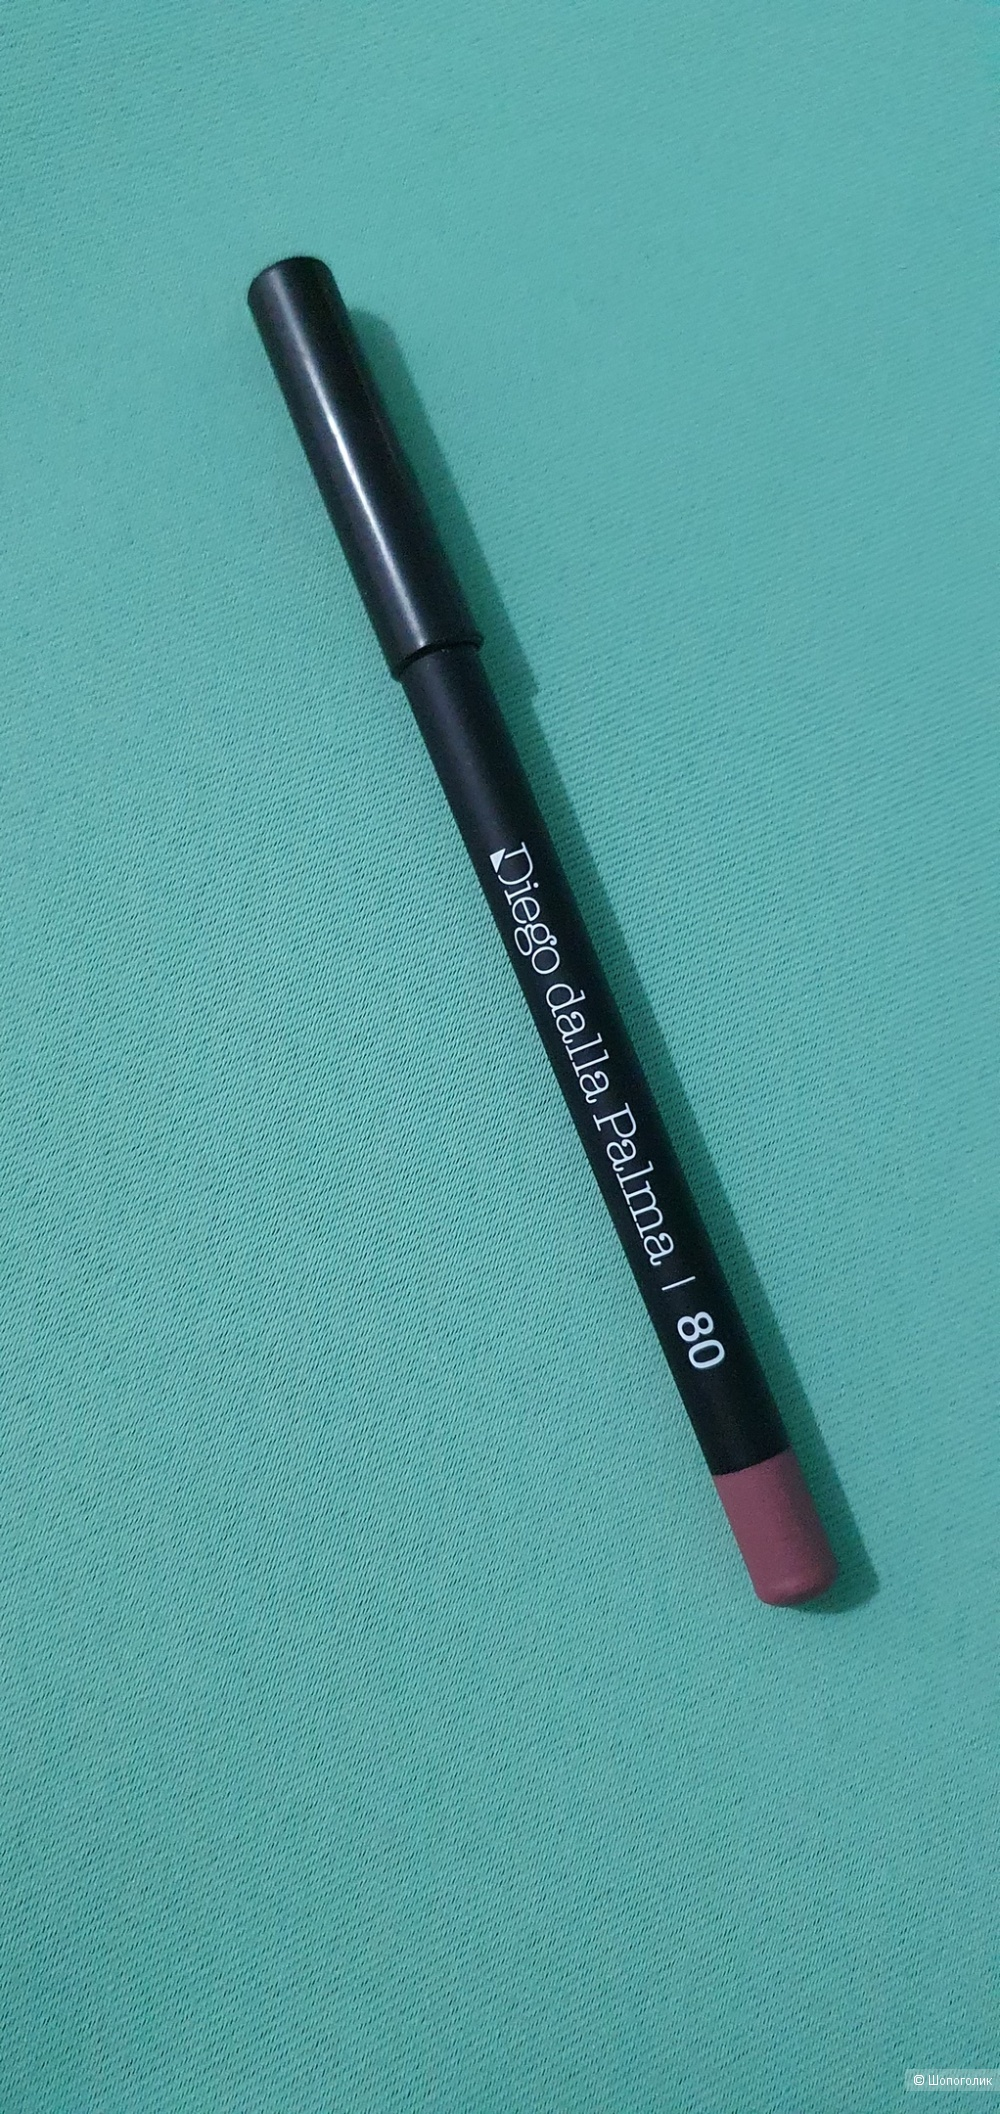 Карандаш для губ diego dalla palma оттенок antique pink